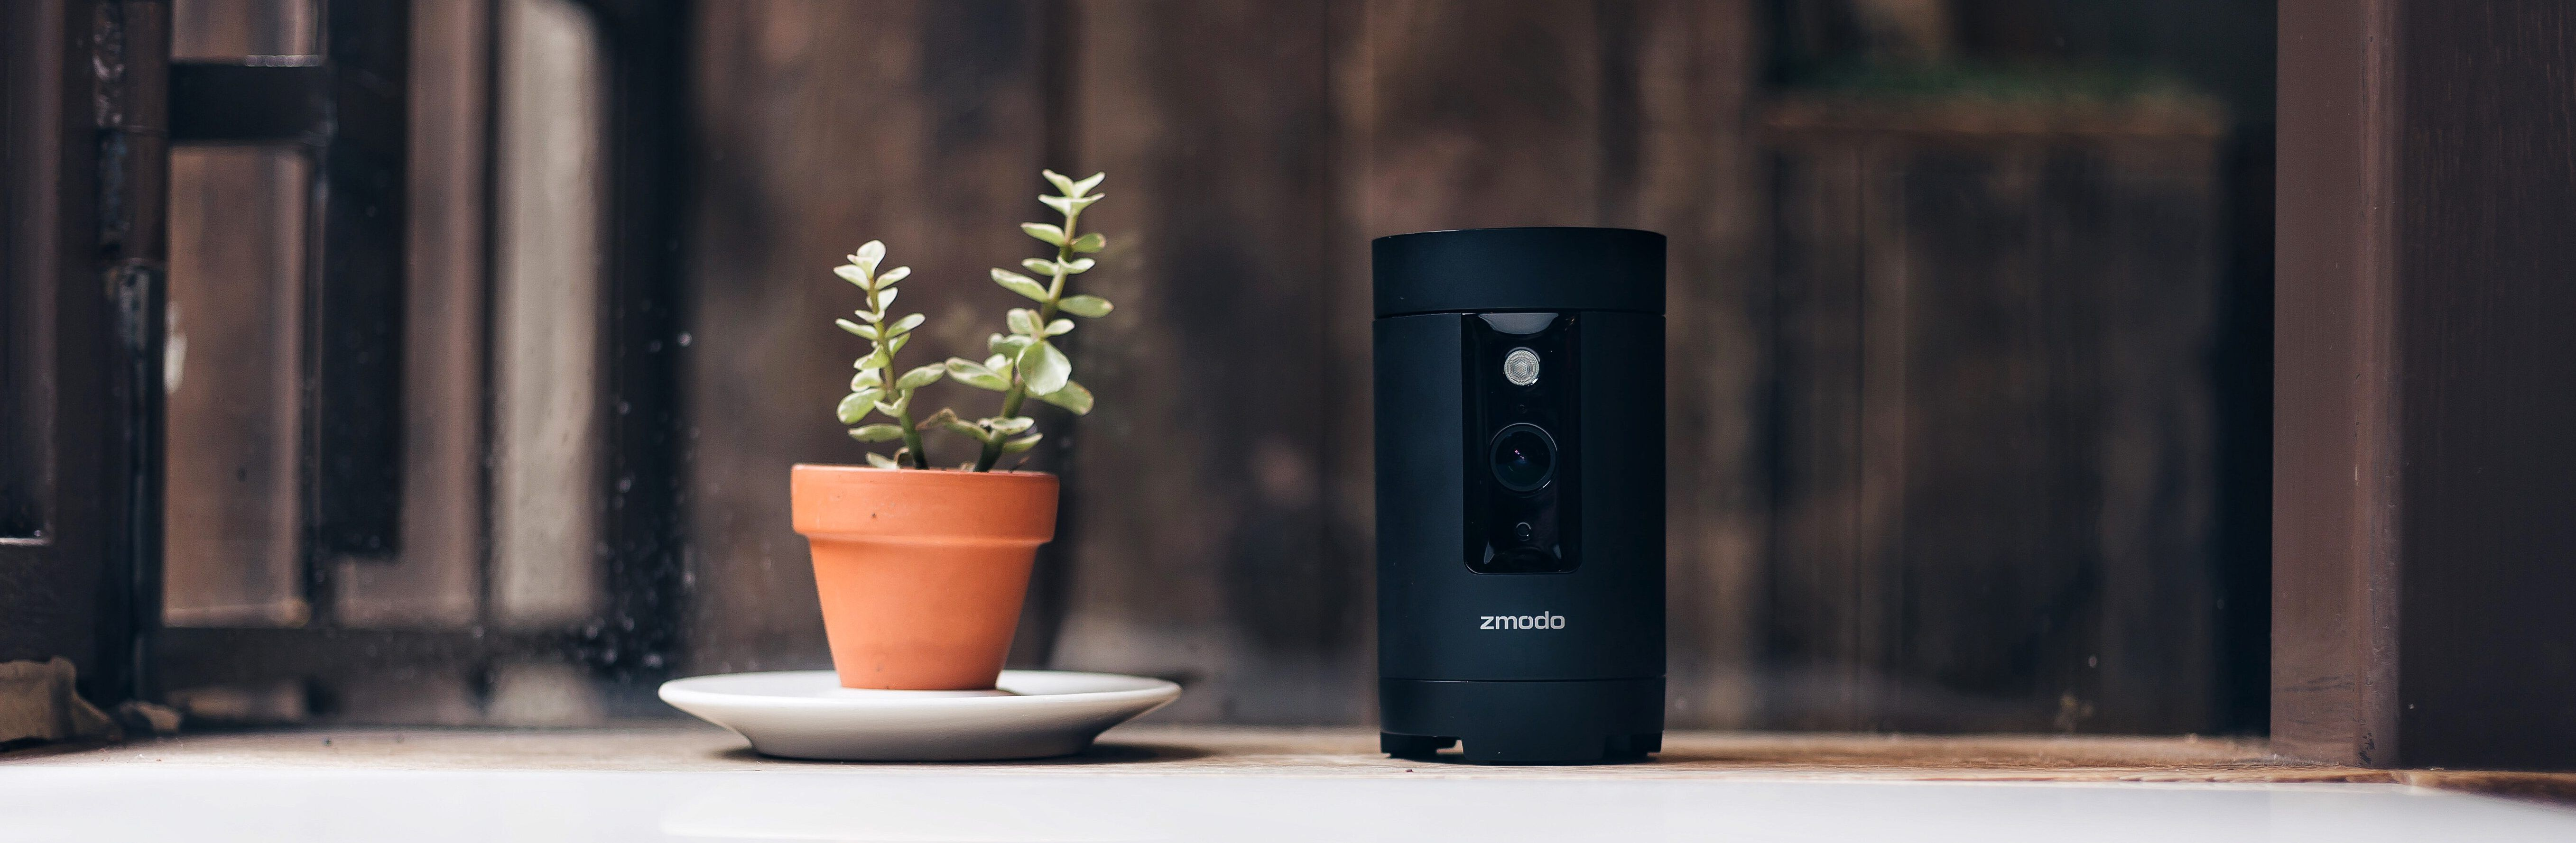 Zmodo Pivot Review – Hands On | Reviews | Security cameras